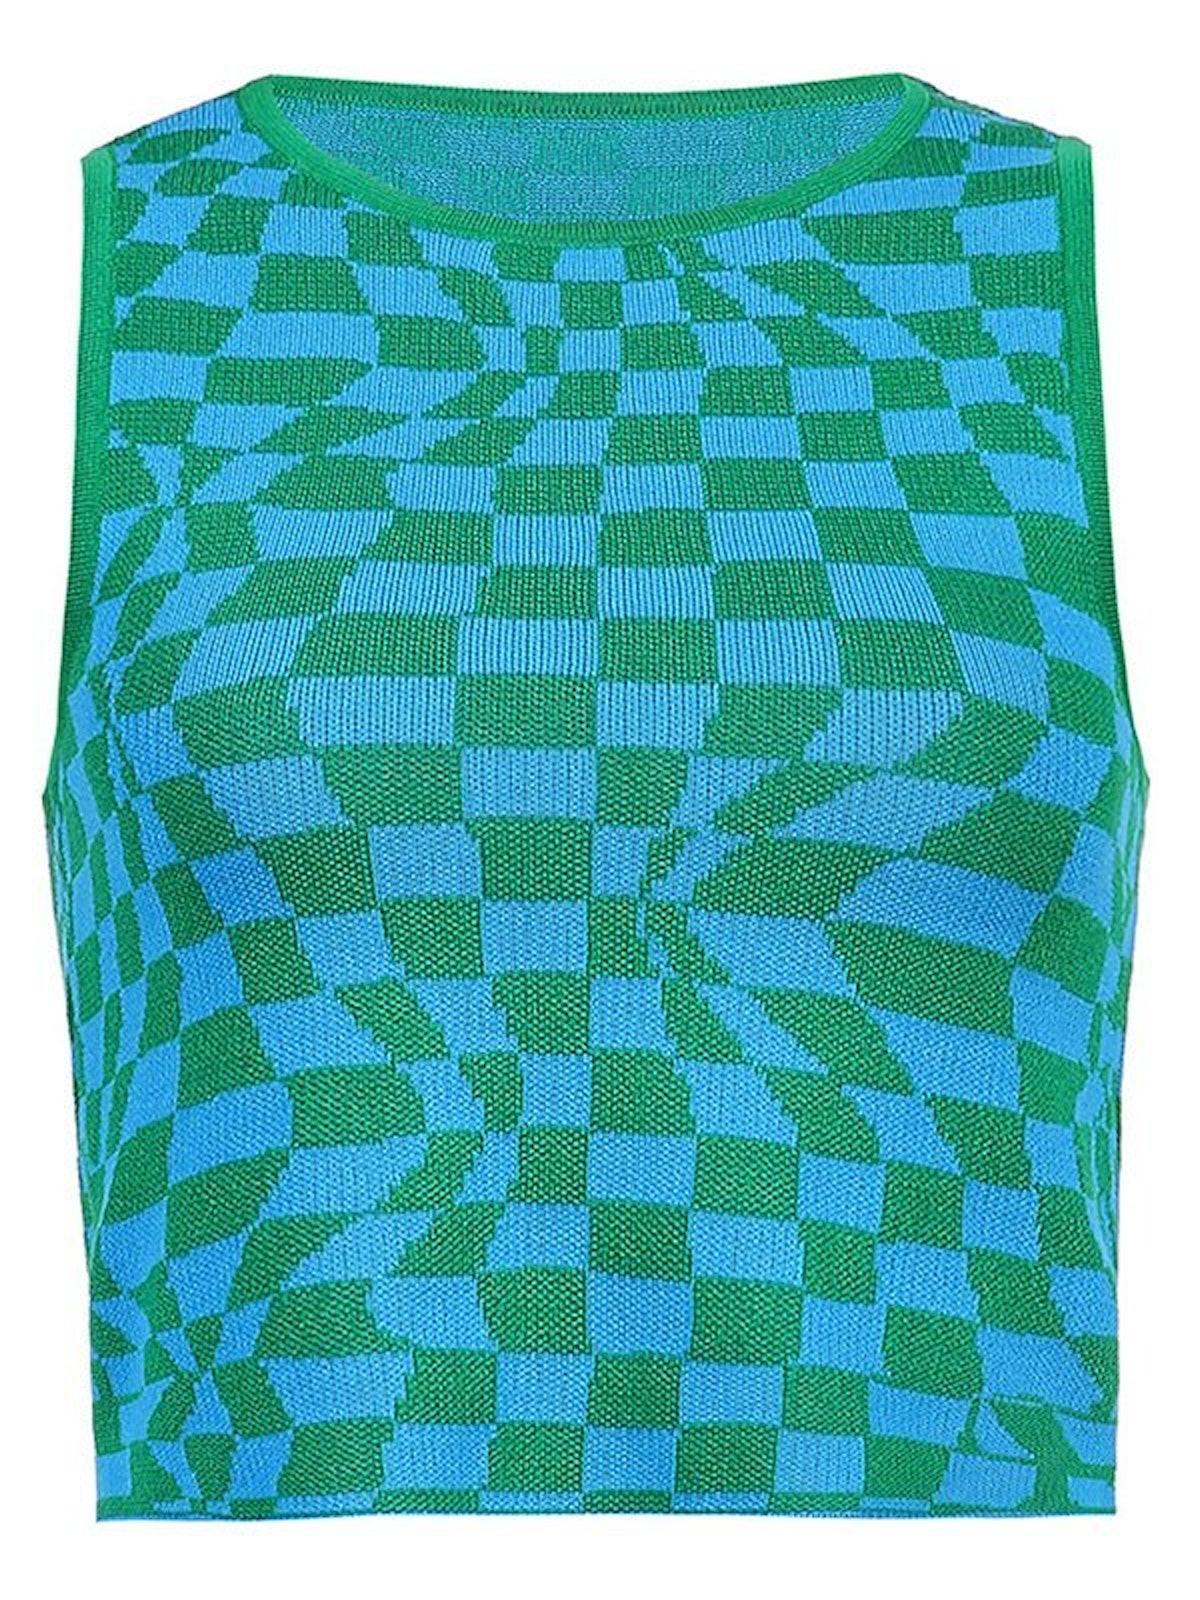 Emmiol Checkered Print Crop Tank Top